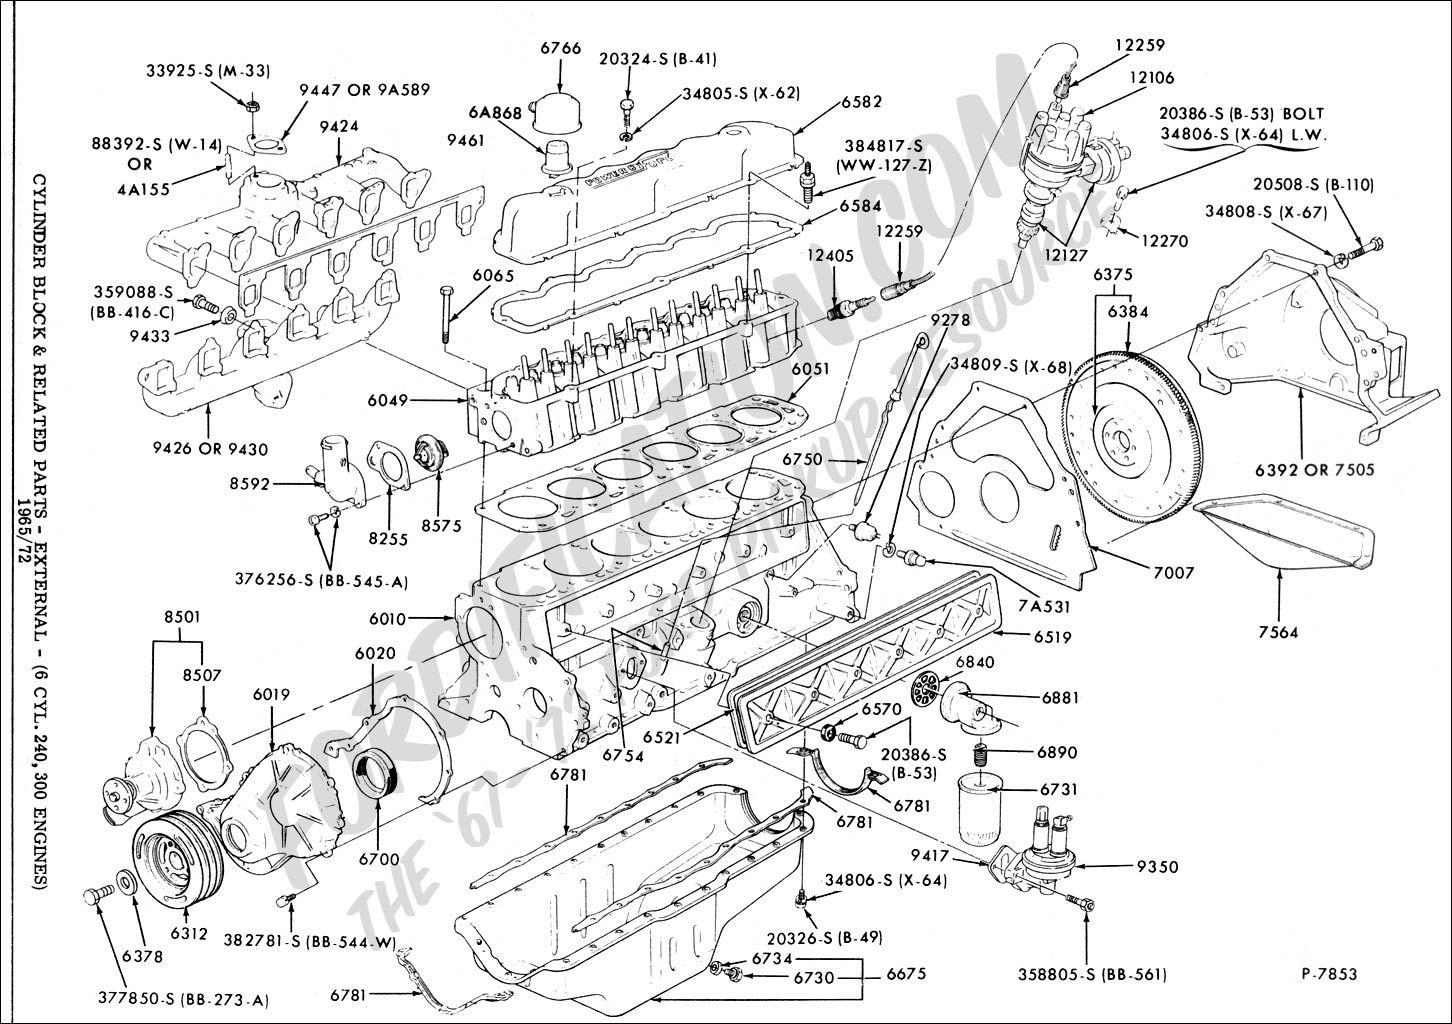 f150 engine diagram standby generator transfer switch wiring ford motor all data straight 6 bb pinterest trucks company diagrams